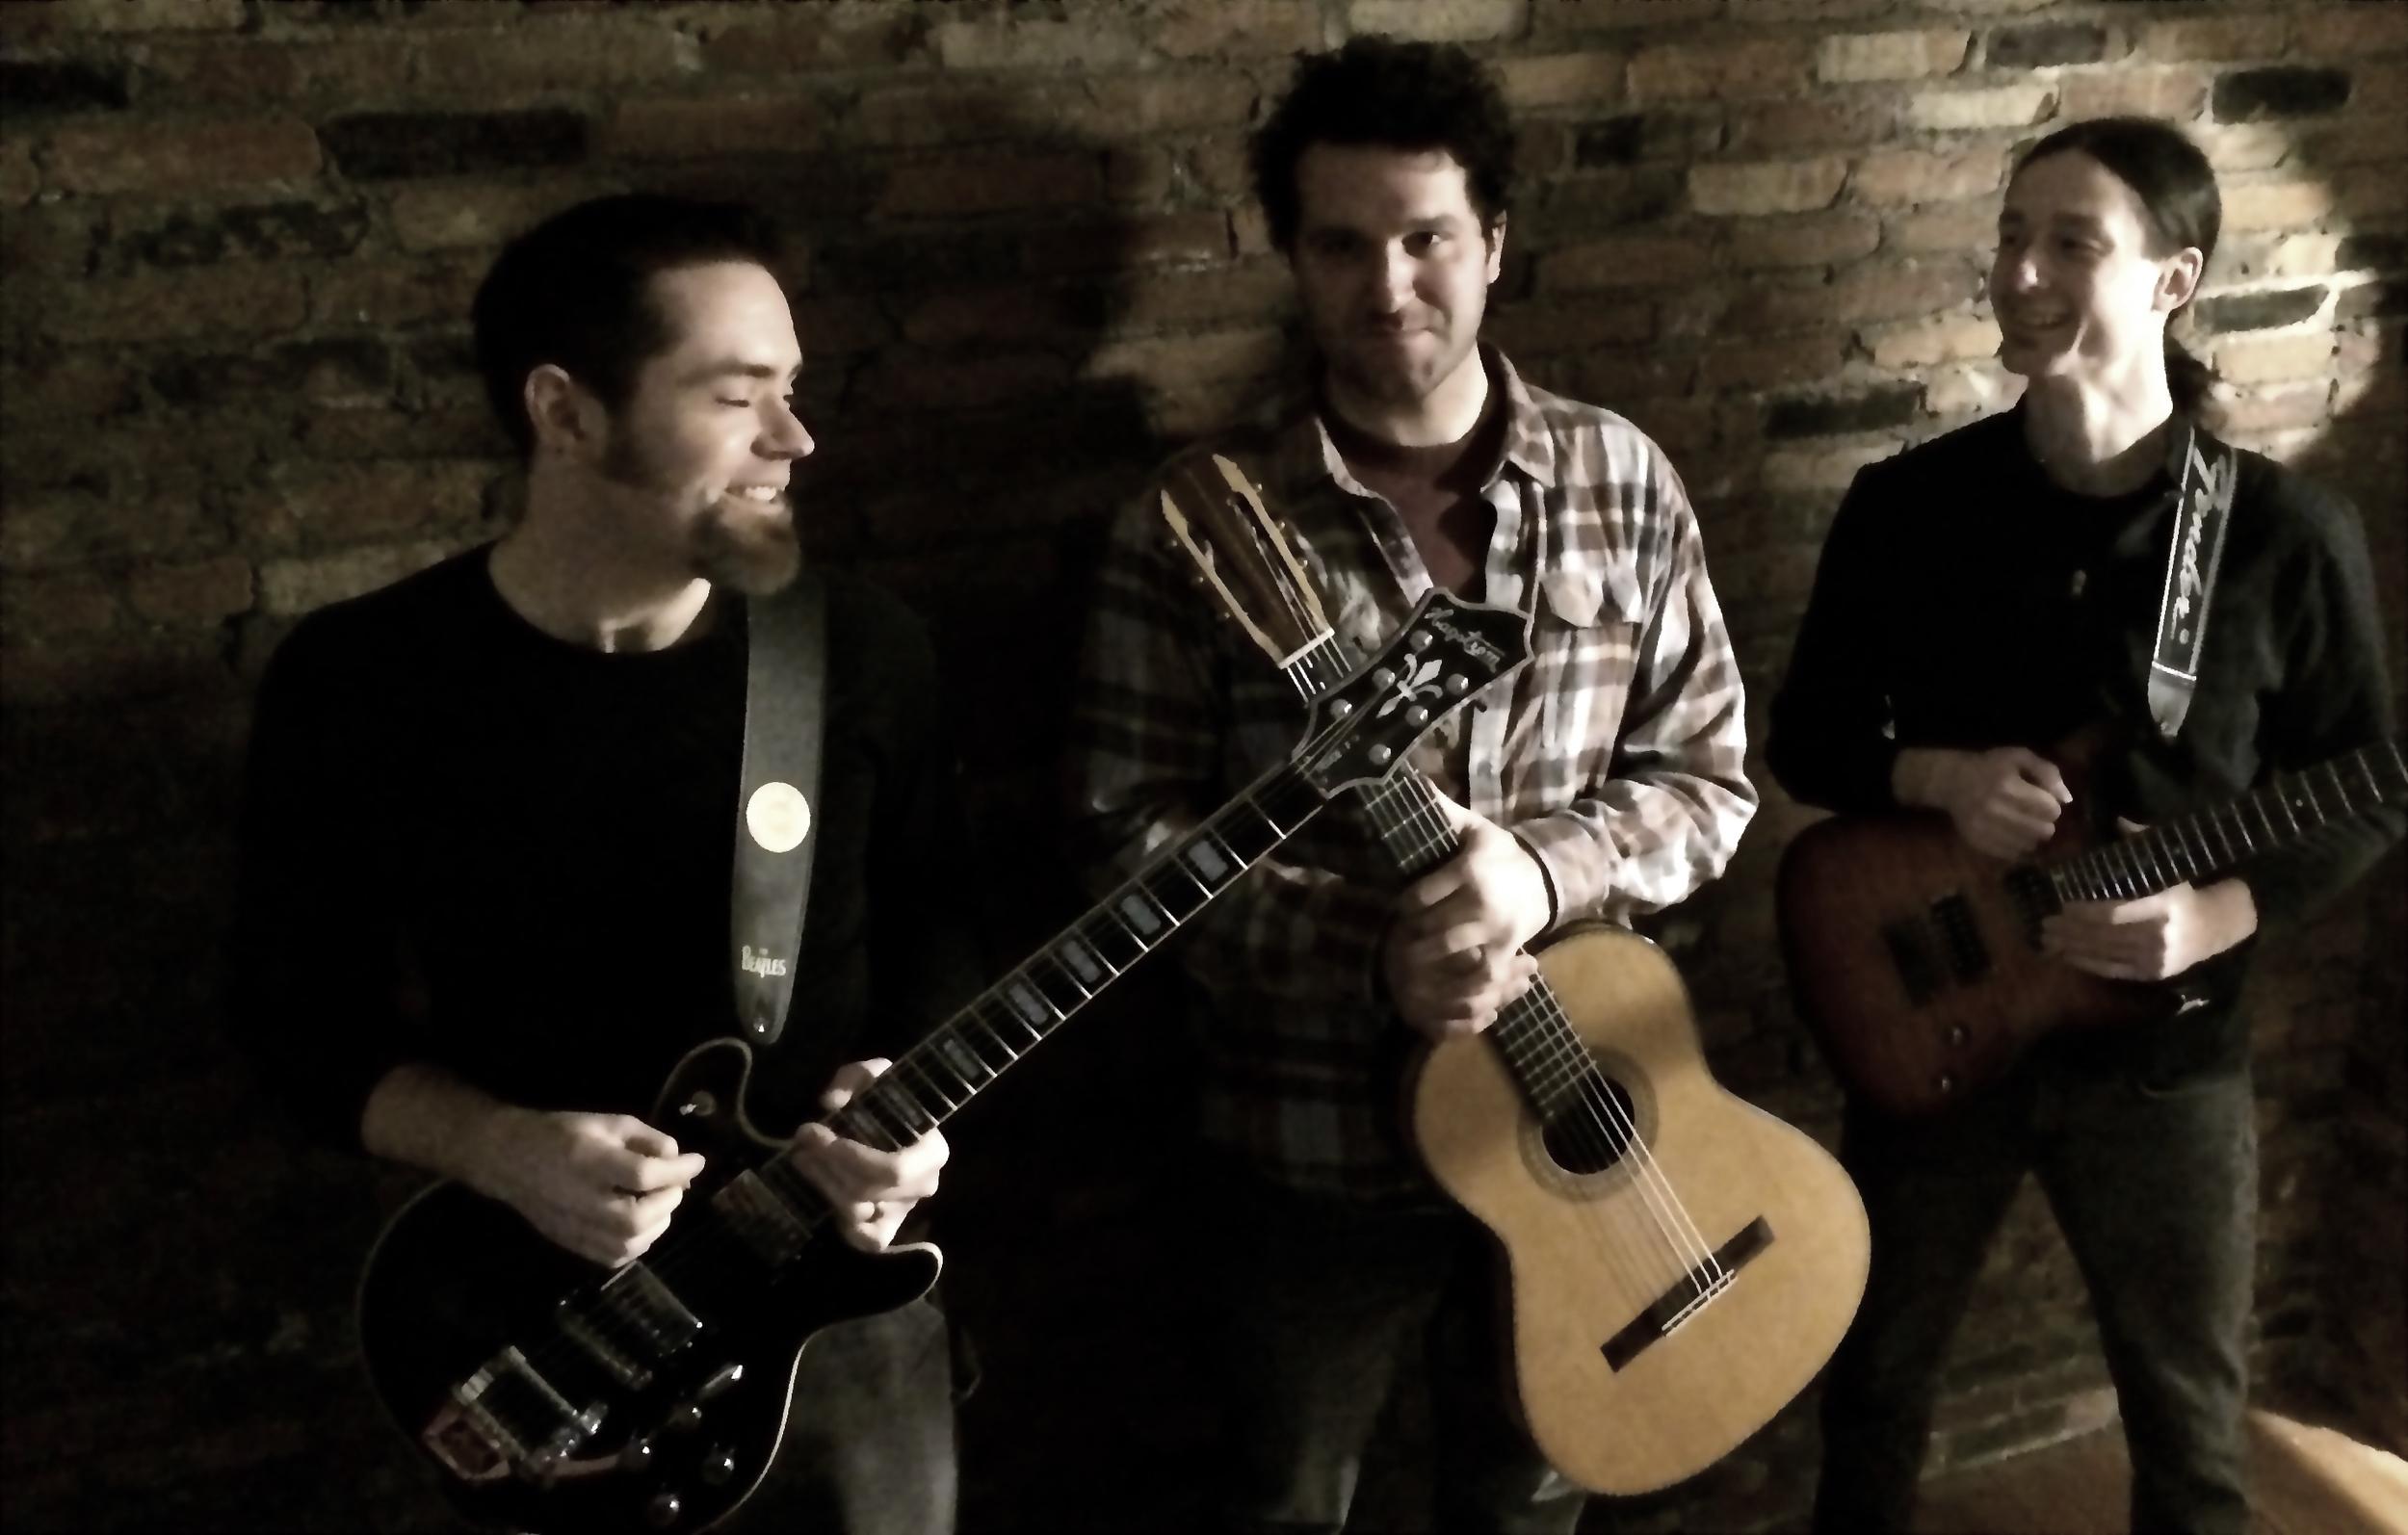 with  Elm City guitar instructors Geoff Williams and Kurt Daniels